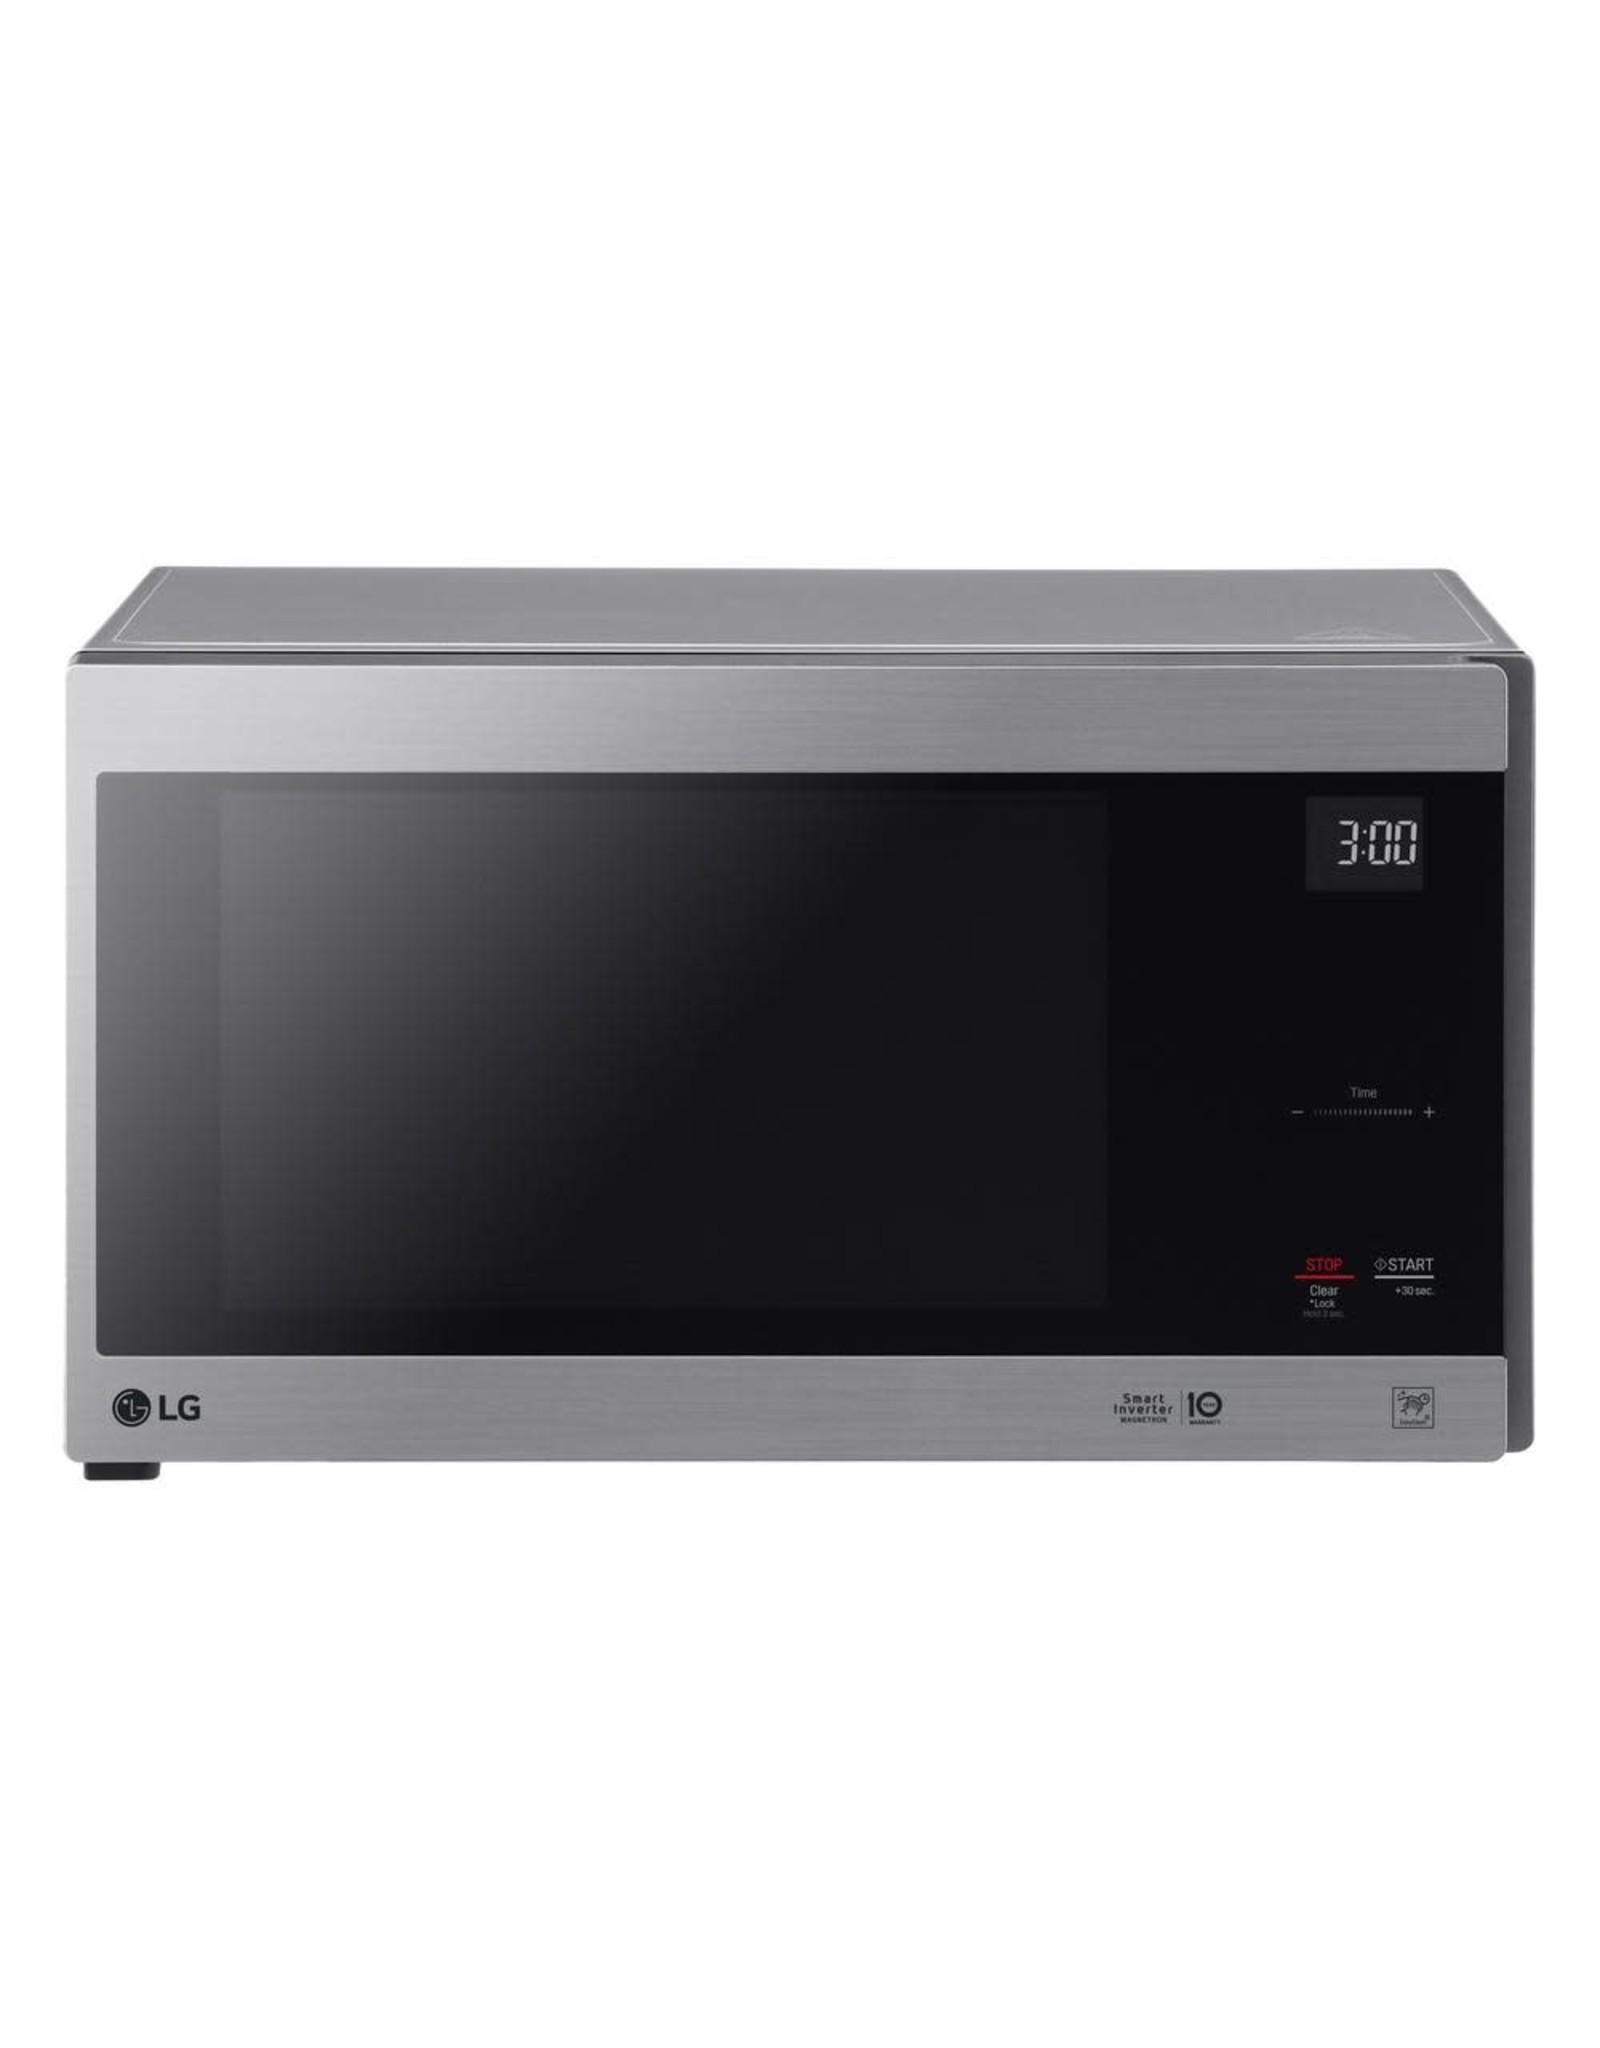 LG Electronics LMC1575ST 1.5 CF NeoChef Countertop Microwave